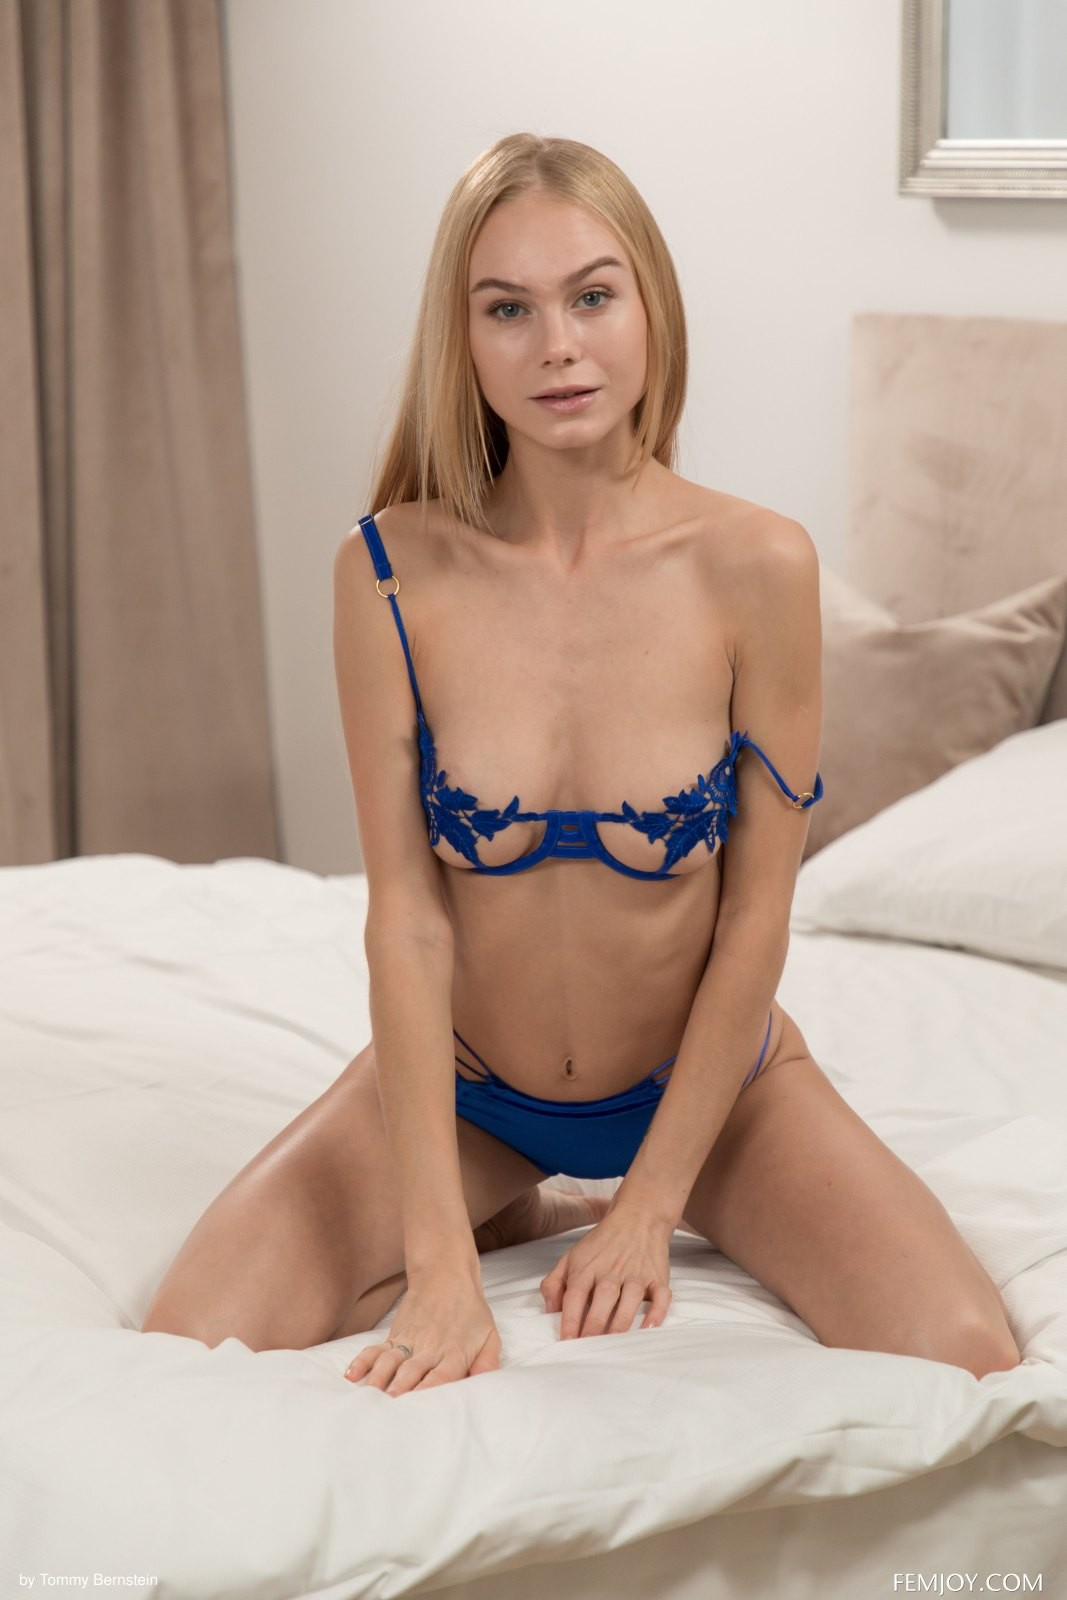 Блондинка шалит на кровати - фото